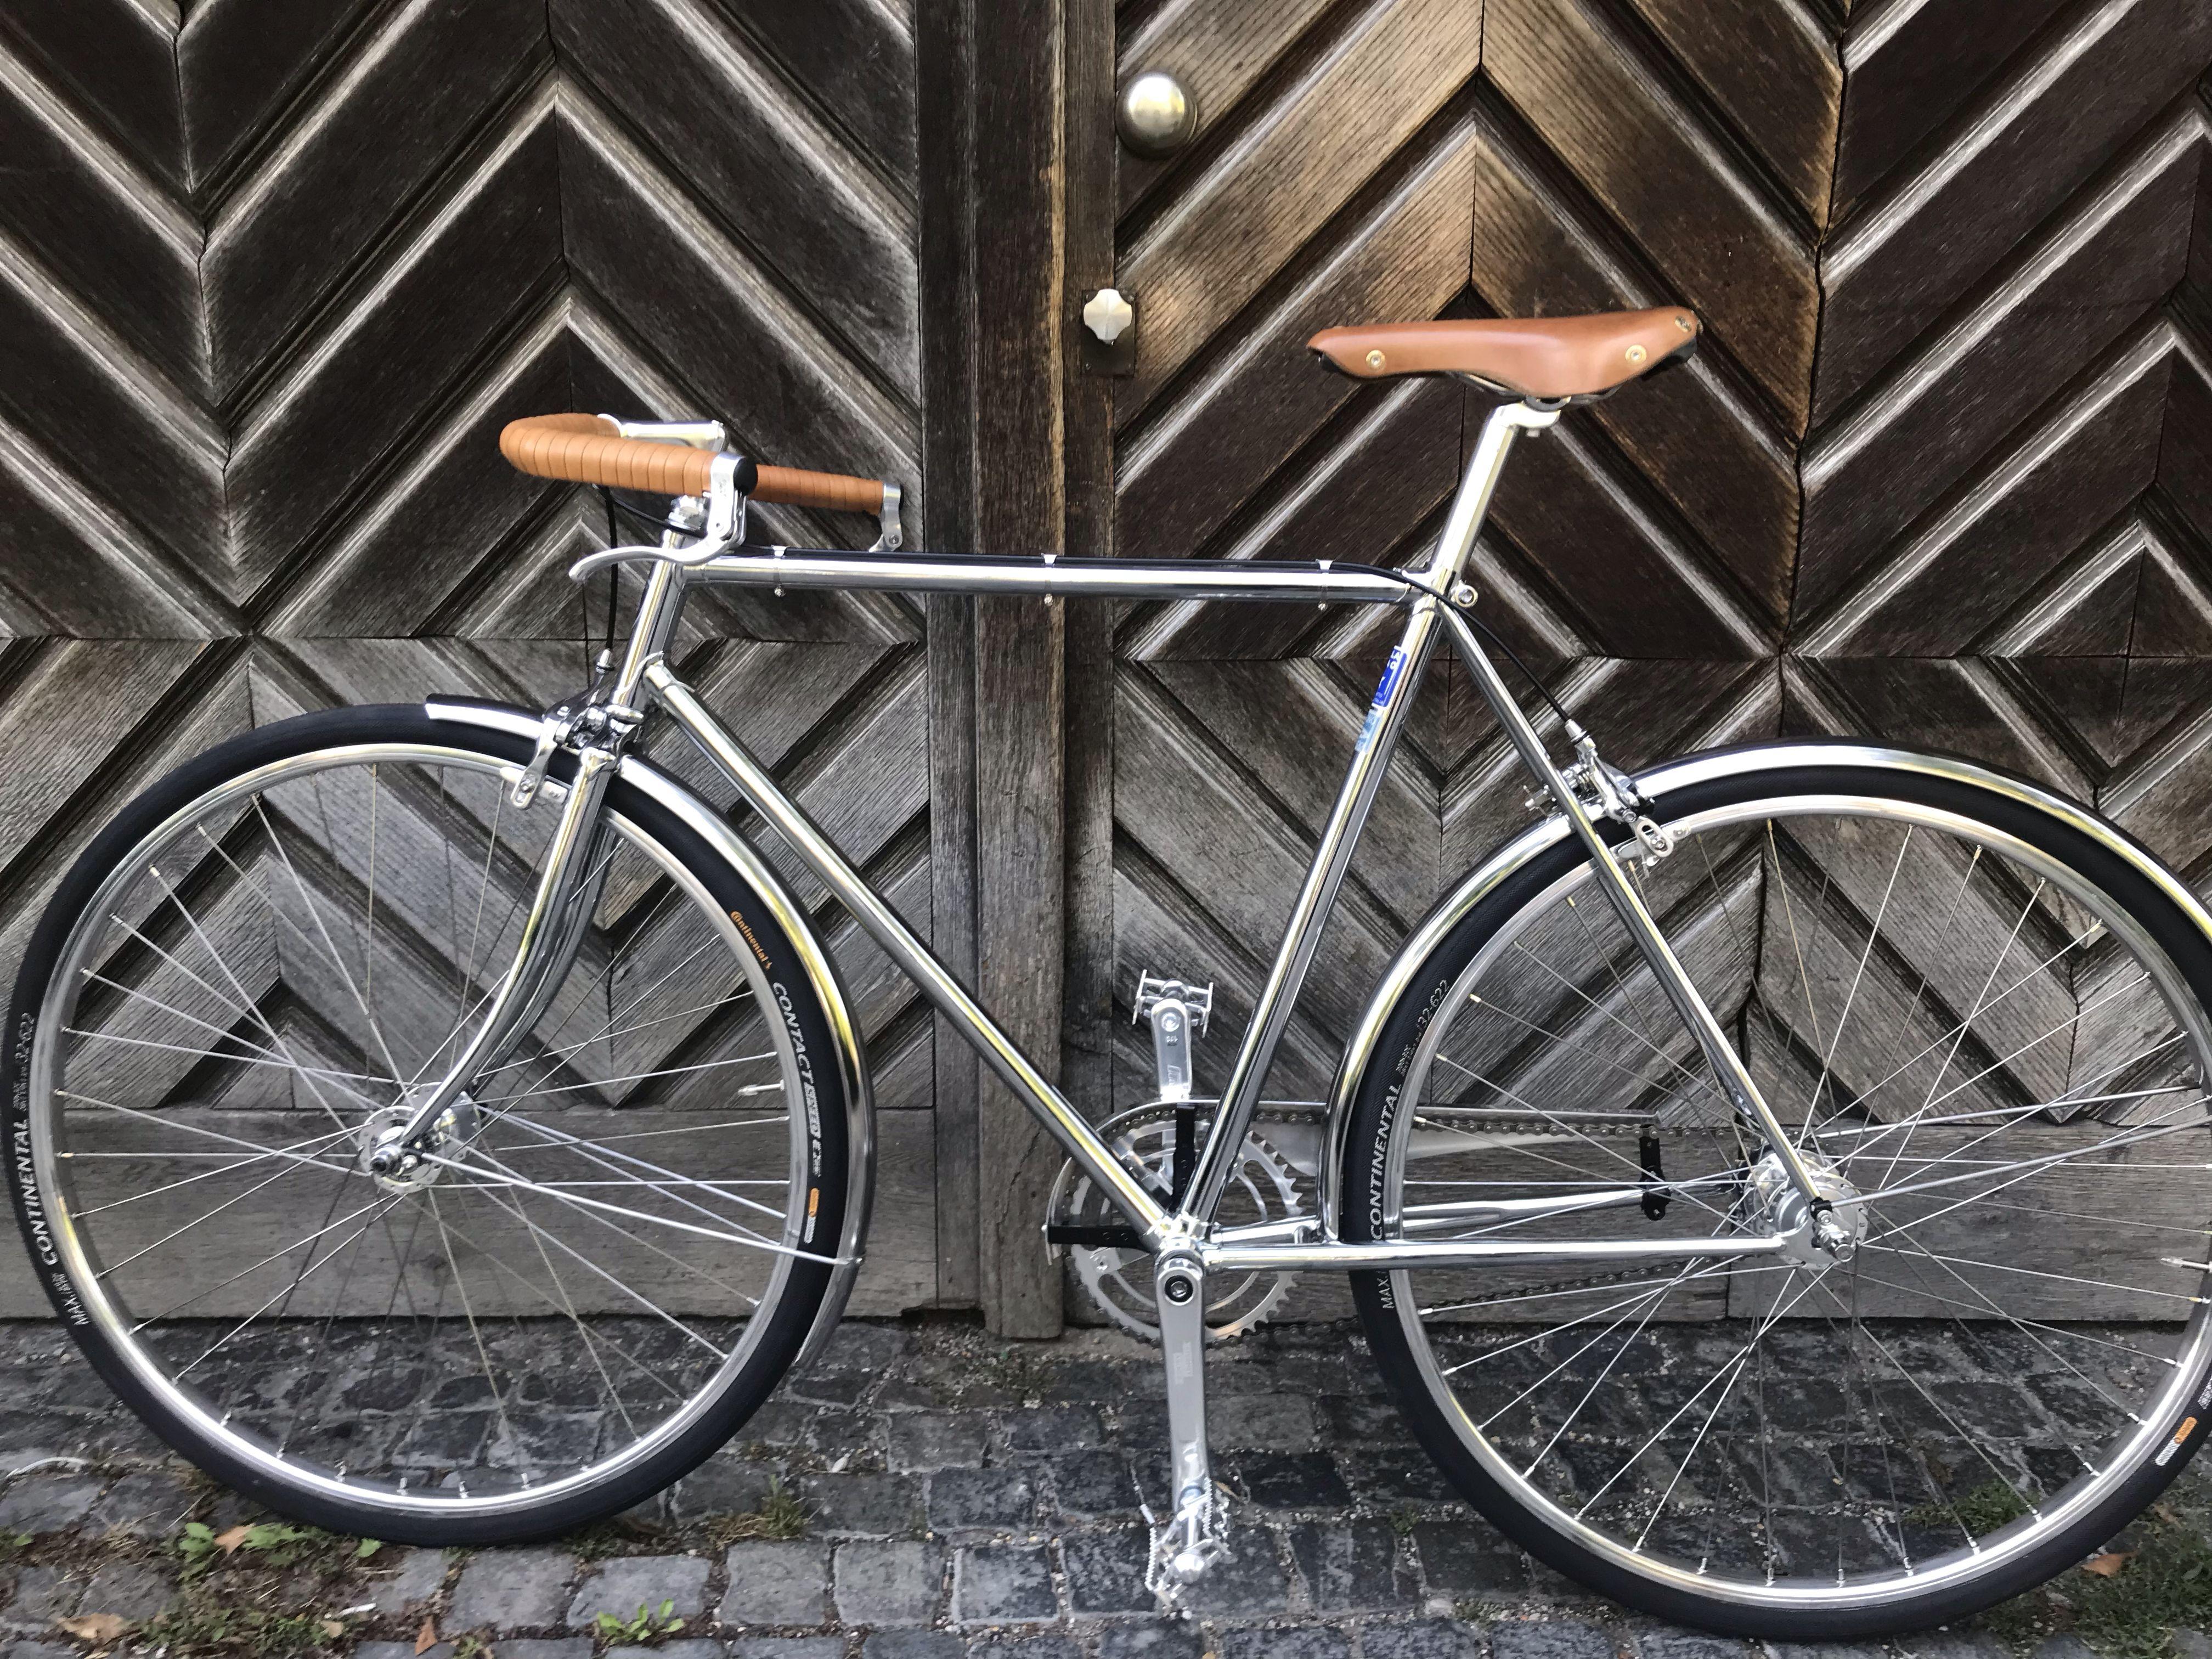 Bella Ciao Monza Fahrradmarken Rad Stadt